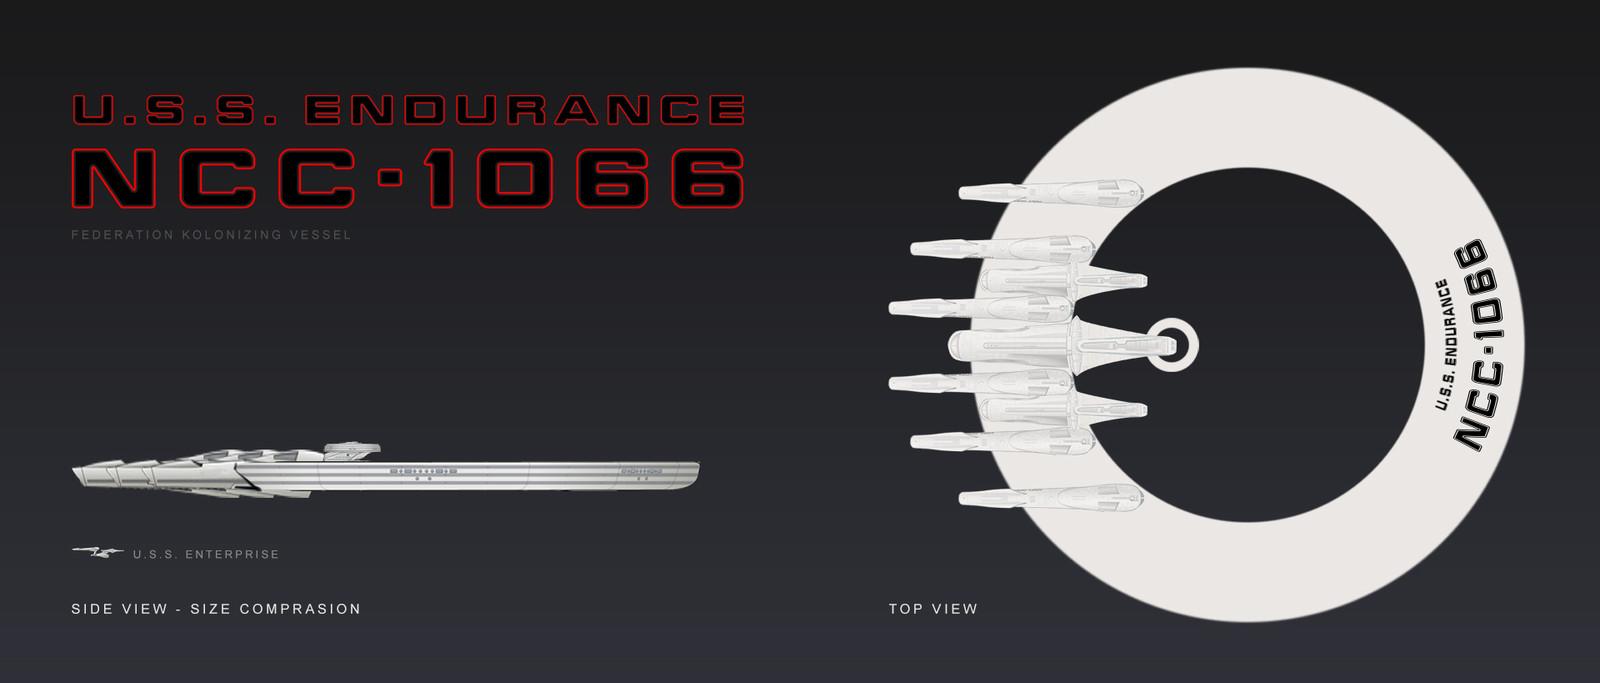 U.S.S. Endurance concept sheet